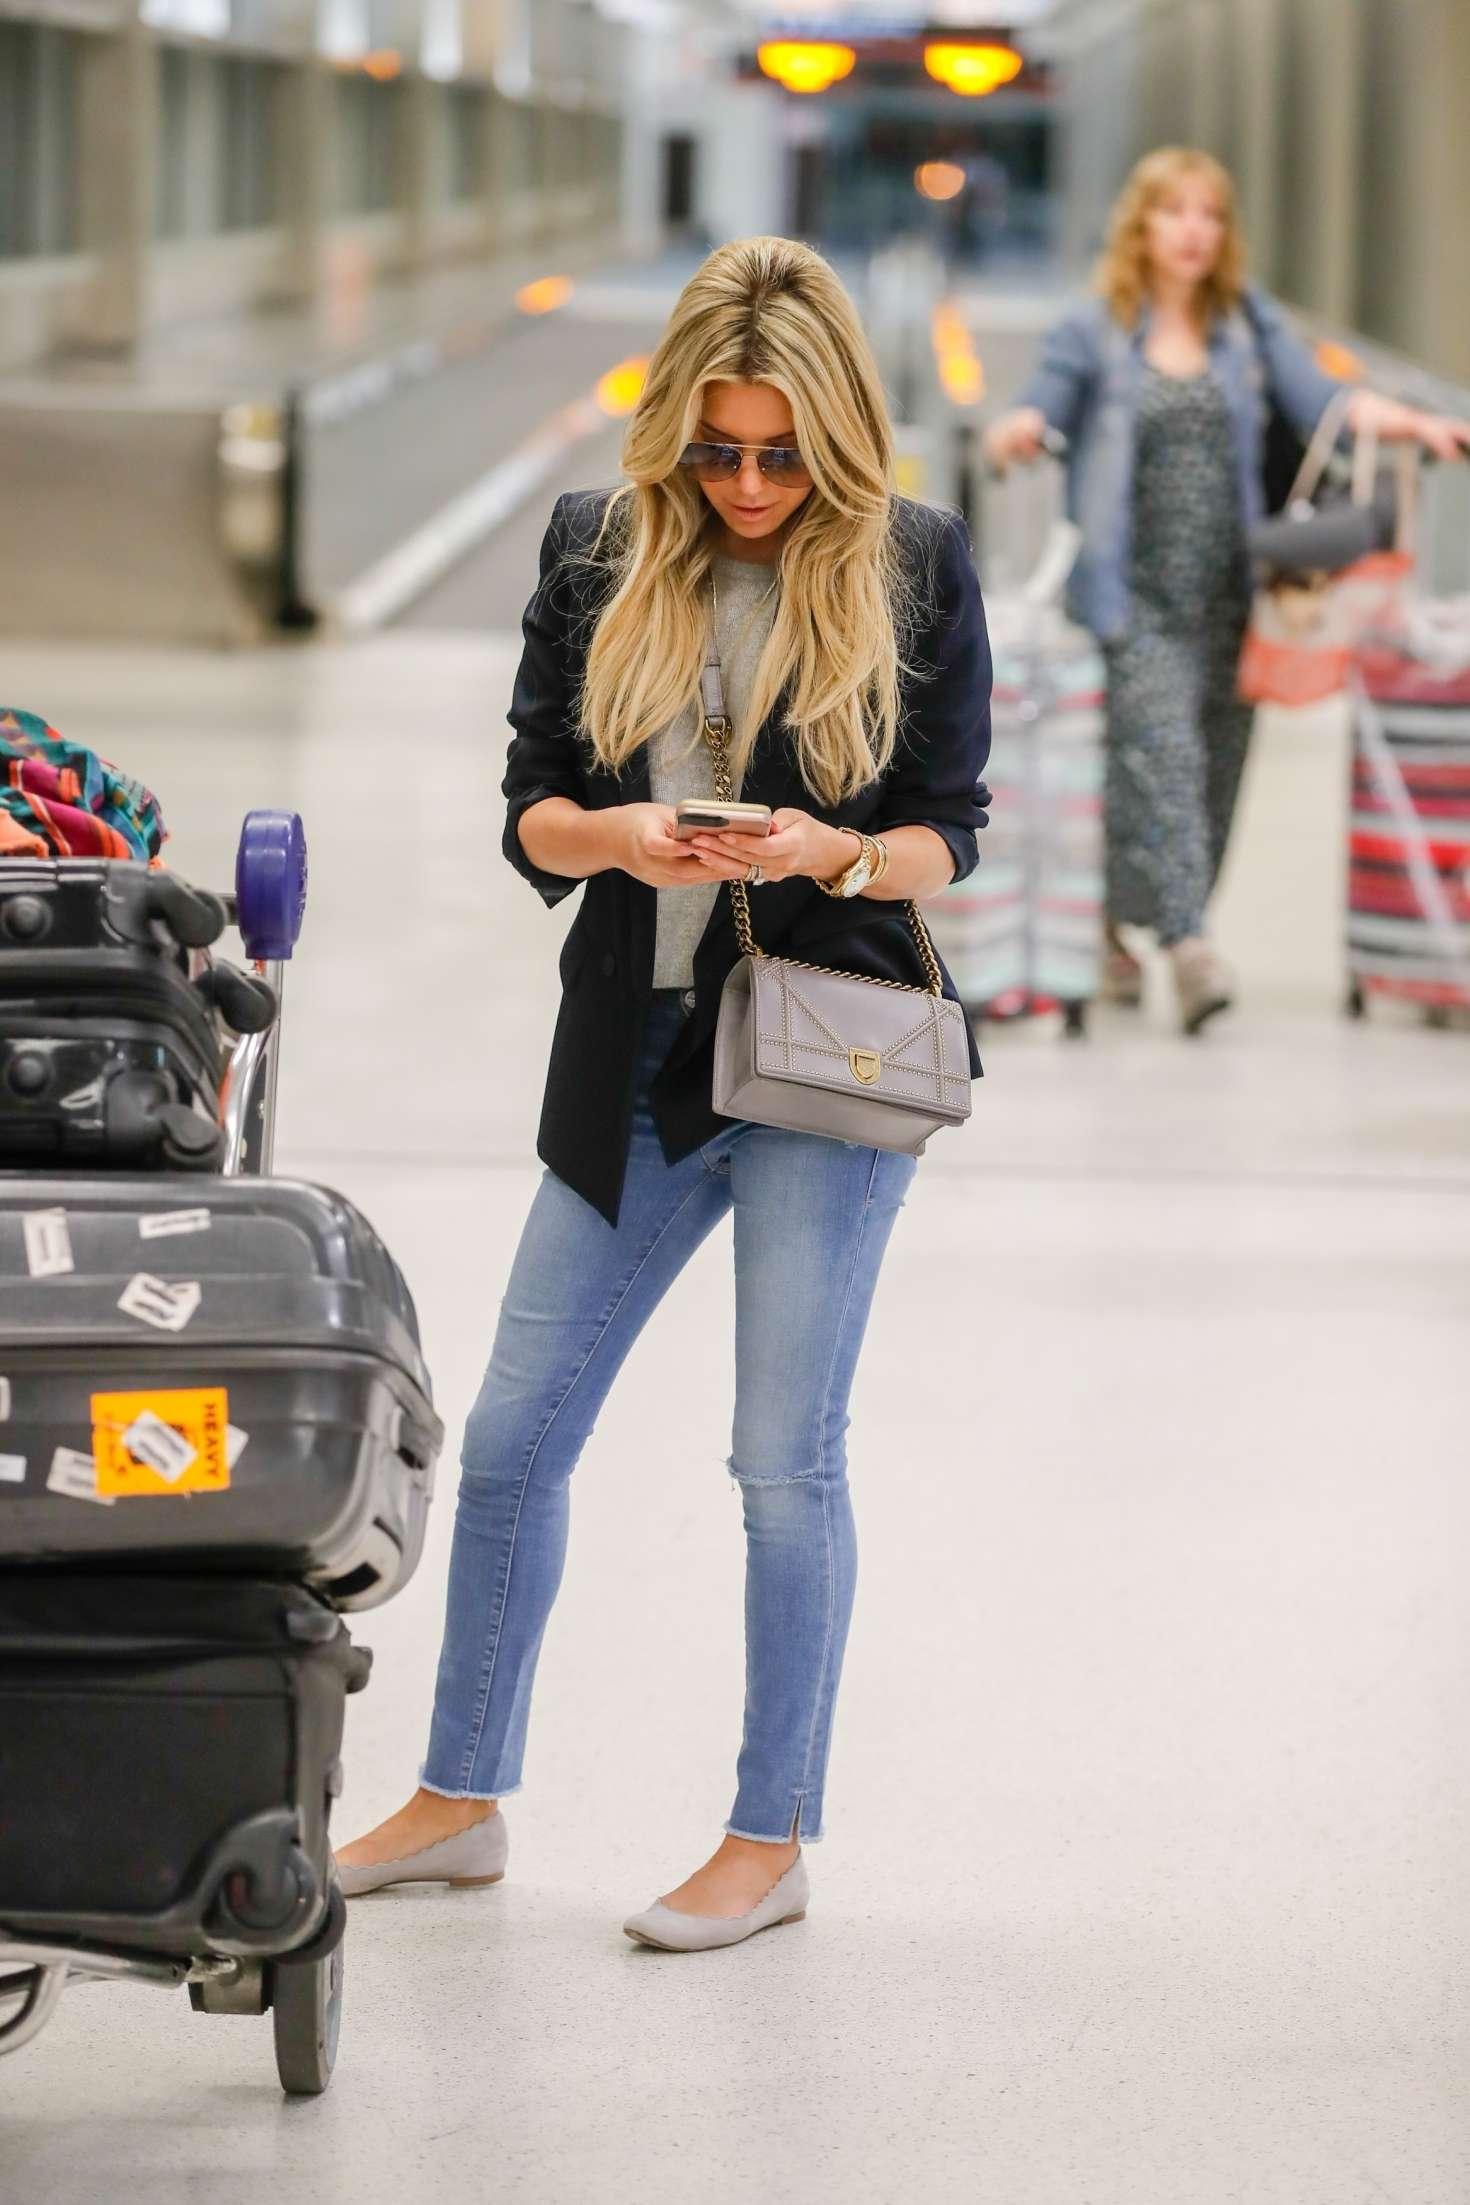 Sylvie Meis 2017 : Sylvie Meis Arrives at Airport in Miami -09